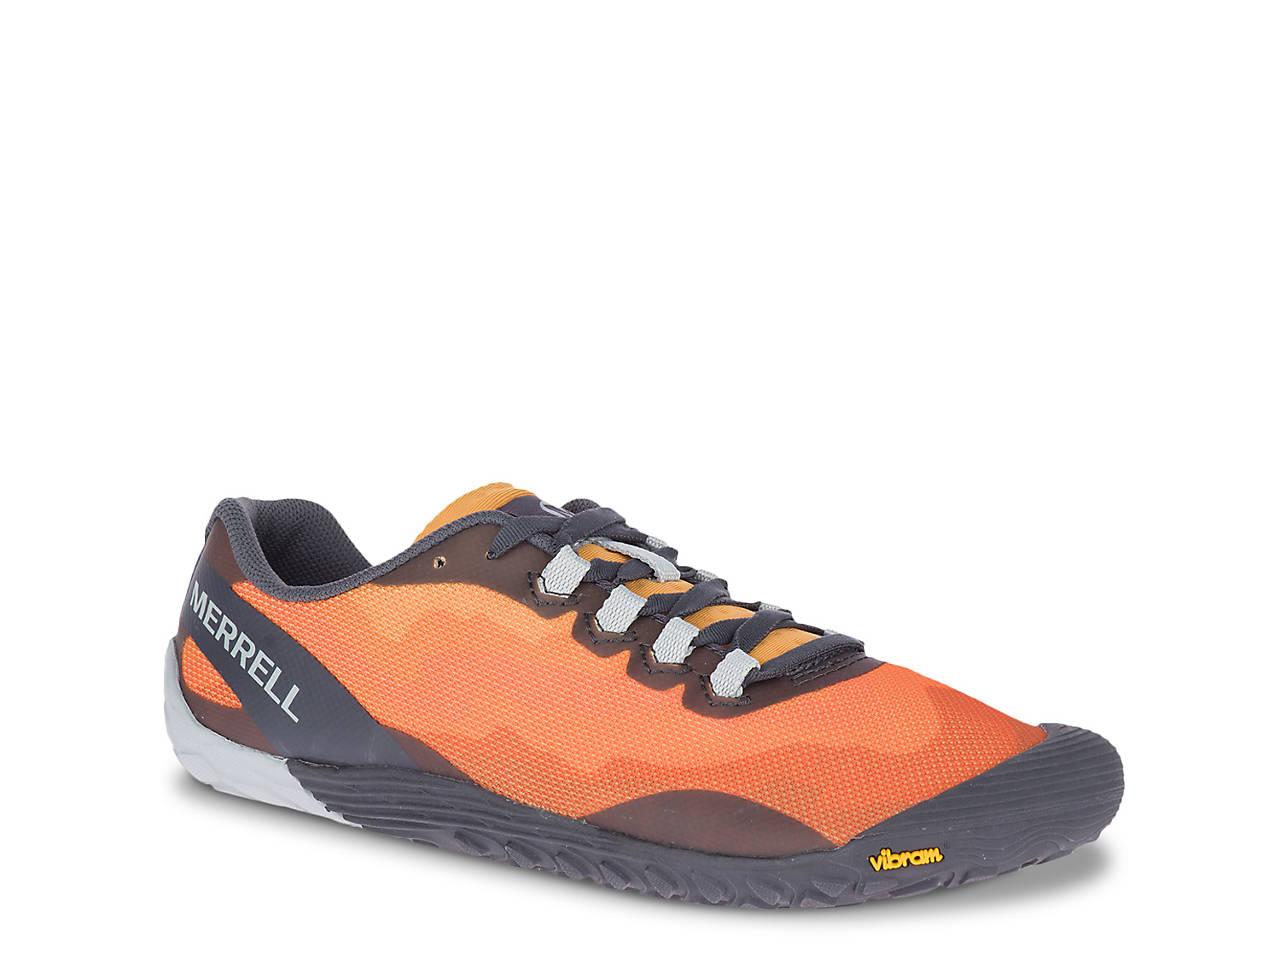 ever popular offer the best Vapor Glove 4 Trail Shoe